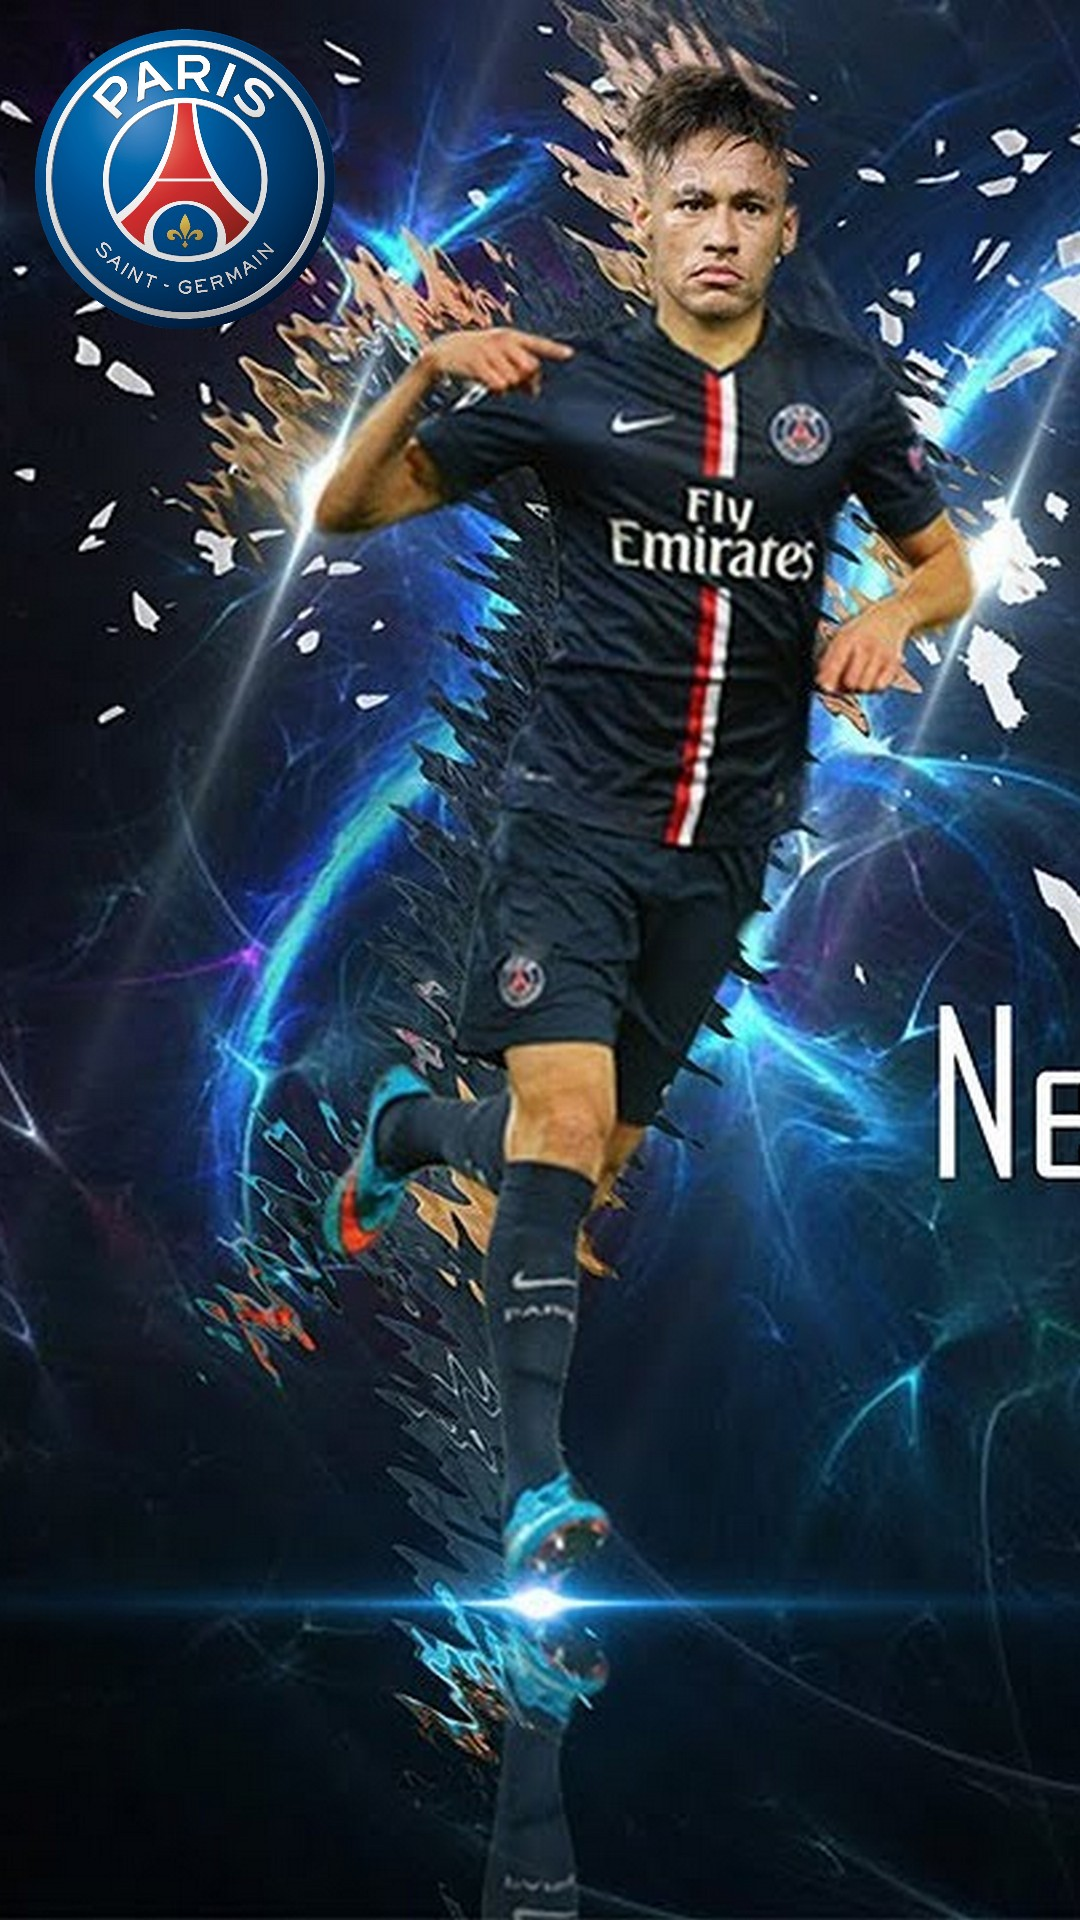 neymar psg iphone 8 wallpaper 2021